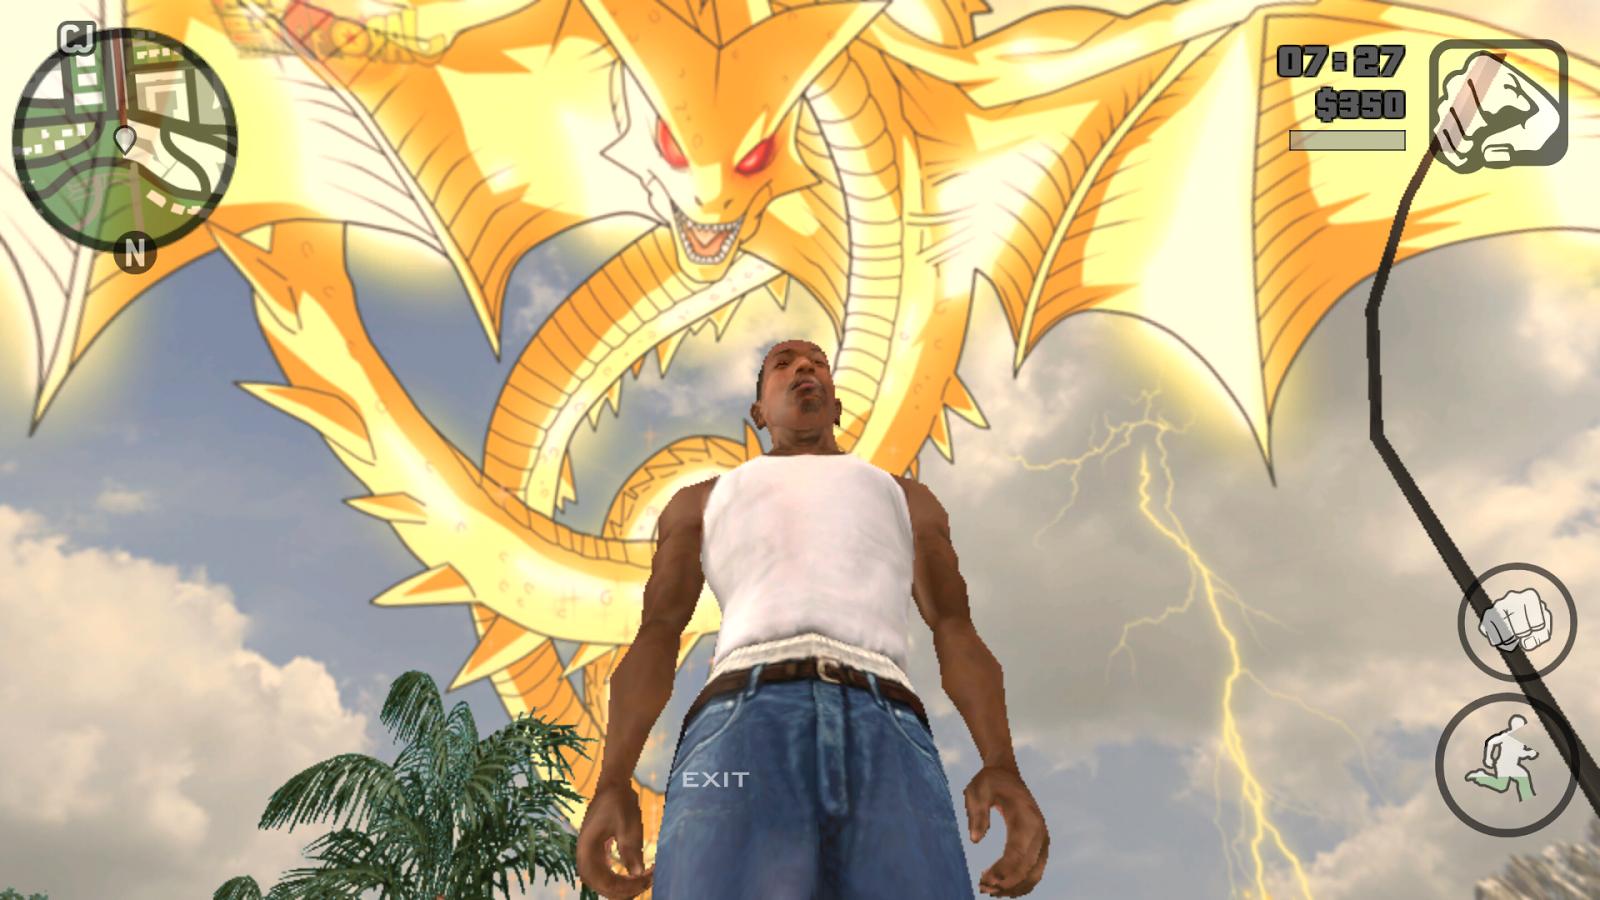 Dragon Ball Super Mod in Gta Sa Android